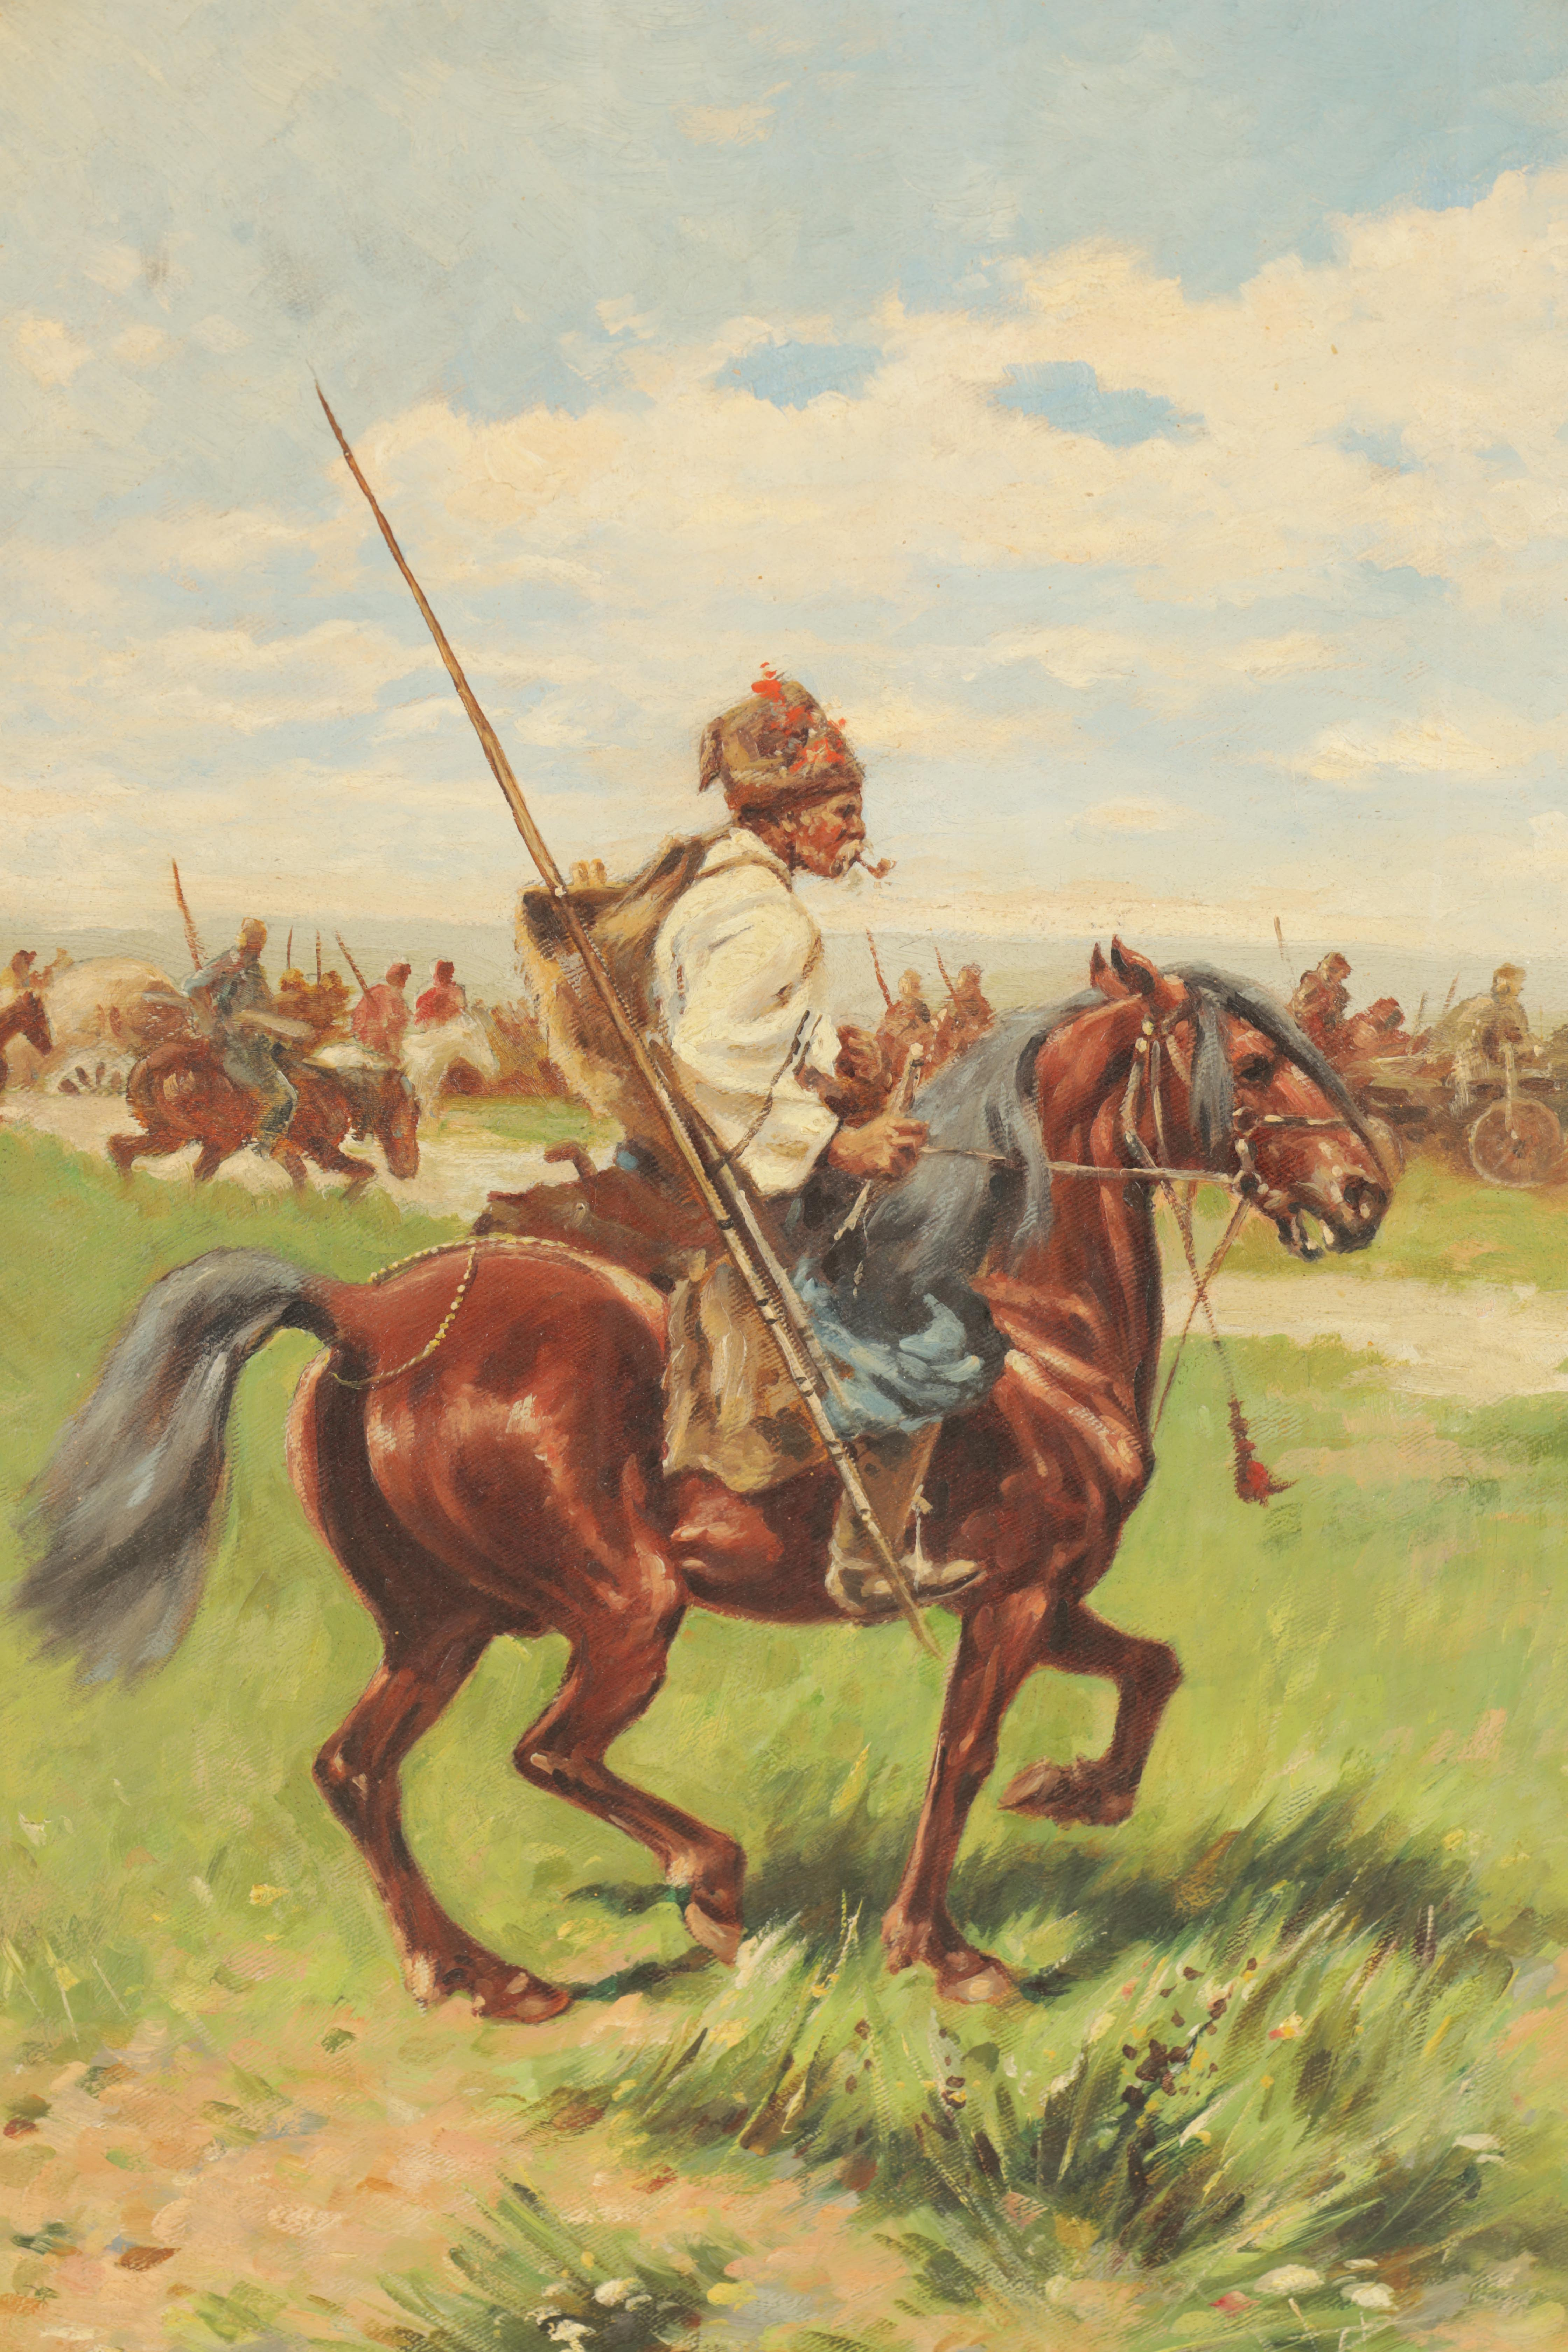 JOSEF VON BRANDT. POLISH, 1841-1928 OIL ON CANVAS Cossacks fording 49.5cm high, 33.5cm wide - signed - Image 2 of 5